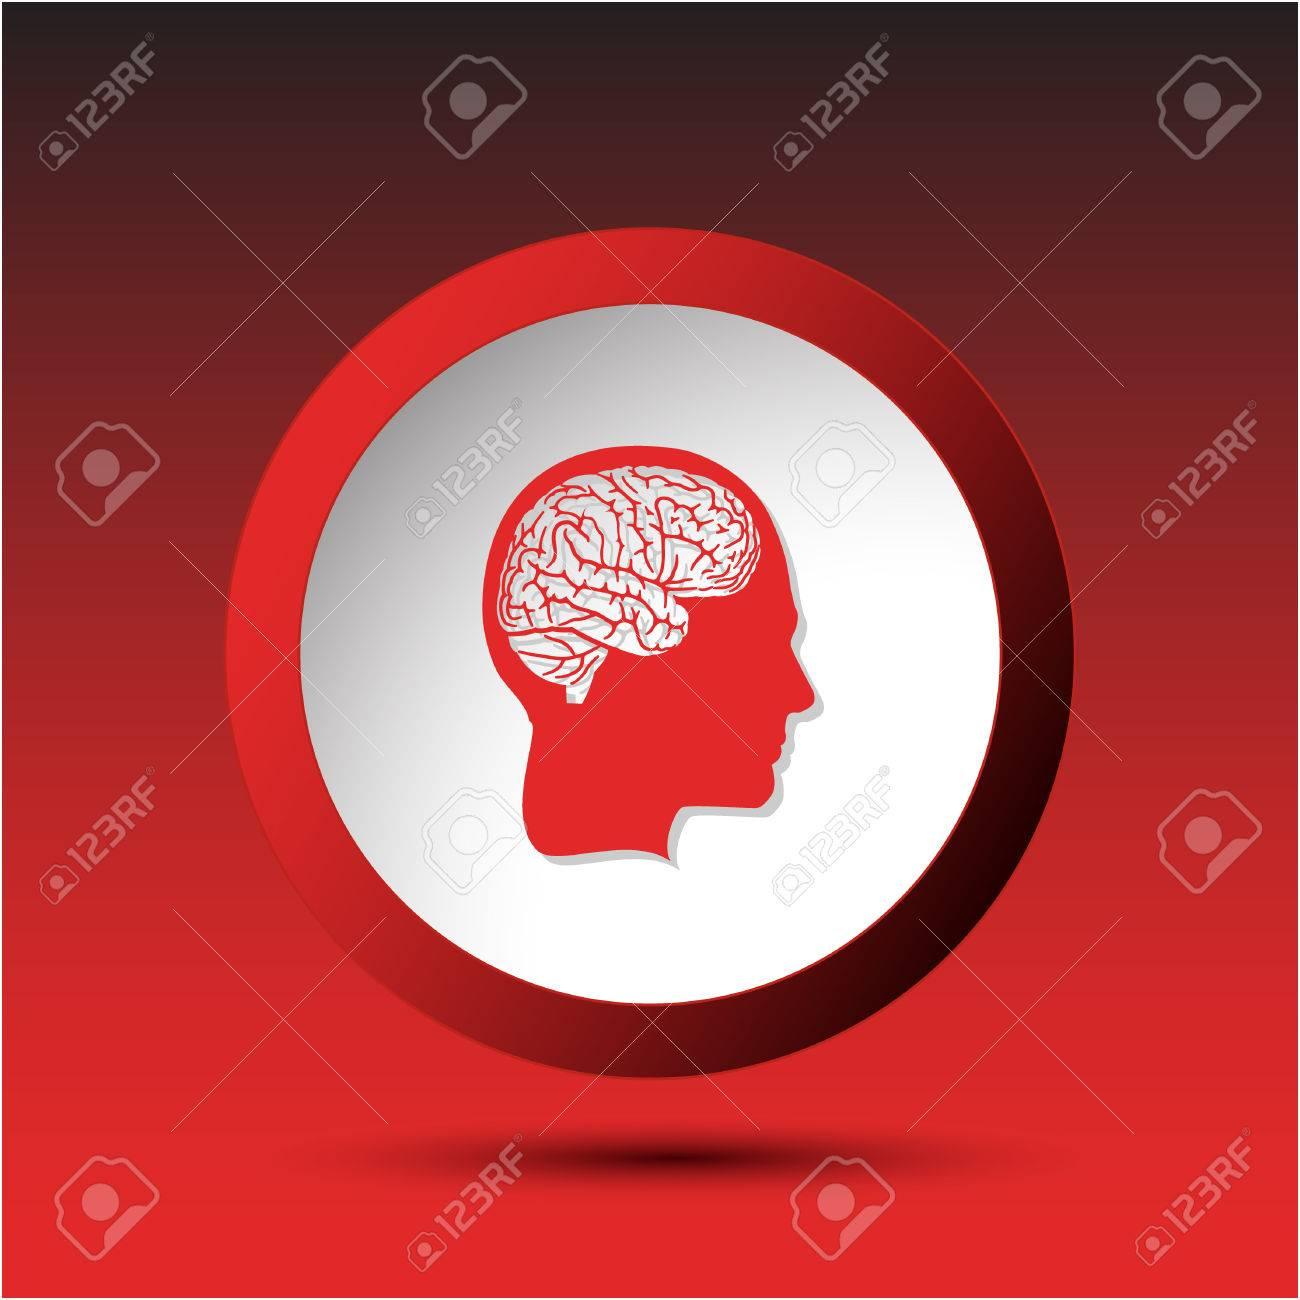 Human brain. Plastic button. Vector illustration. Stock Vector - 25426181